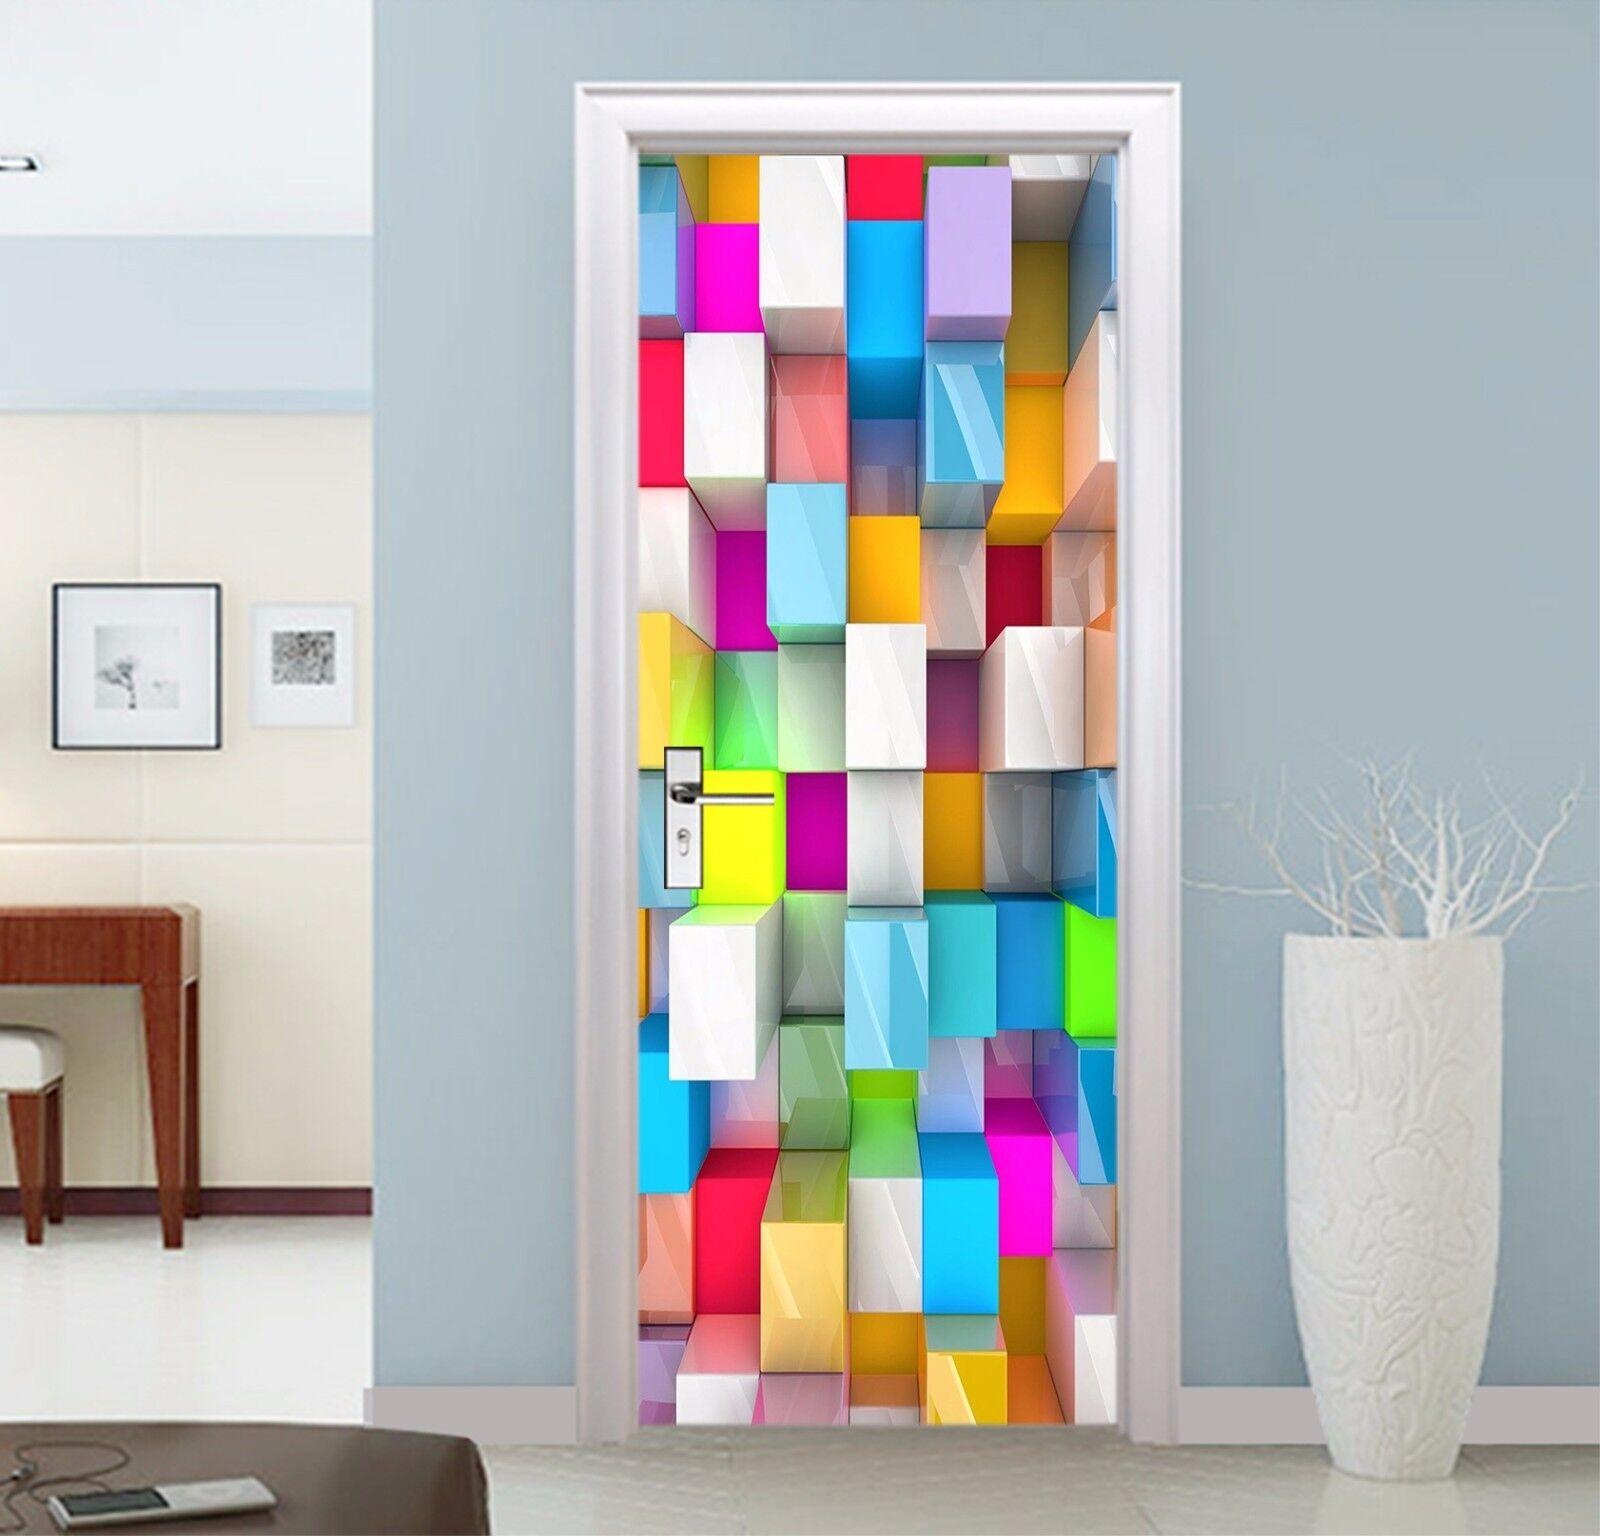 3D Farbe Gitter 746 Tür Wandmalerei Wandaufkleber Aufkleber AJ WALLPAPER DE Kyra  | Verschiedene aktuelle Designs  | Preisreduktion  | Sale Online